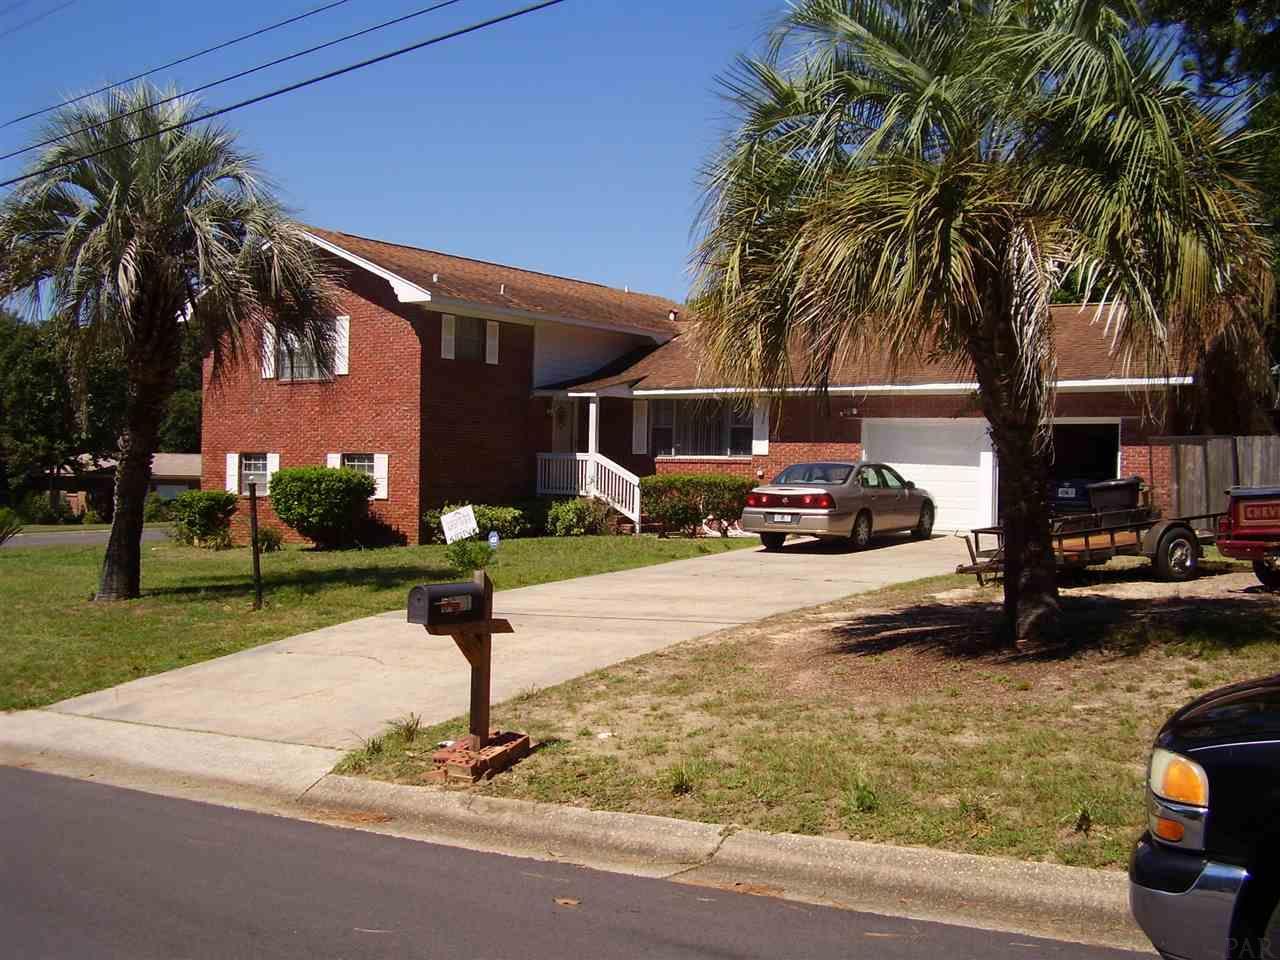 Pensacola Homes 150 000 To 200 000